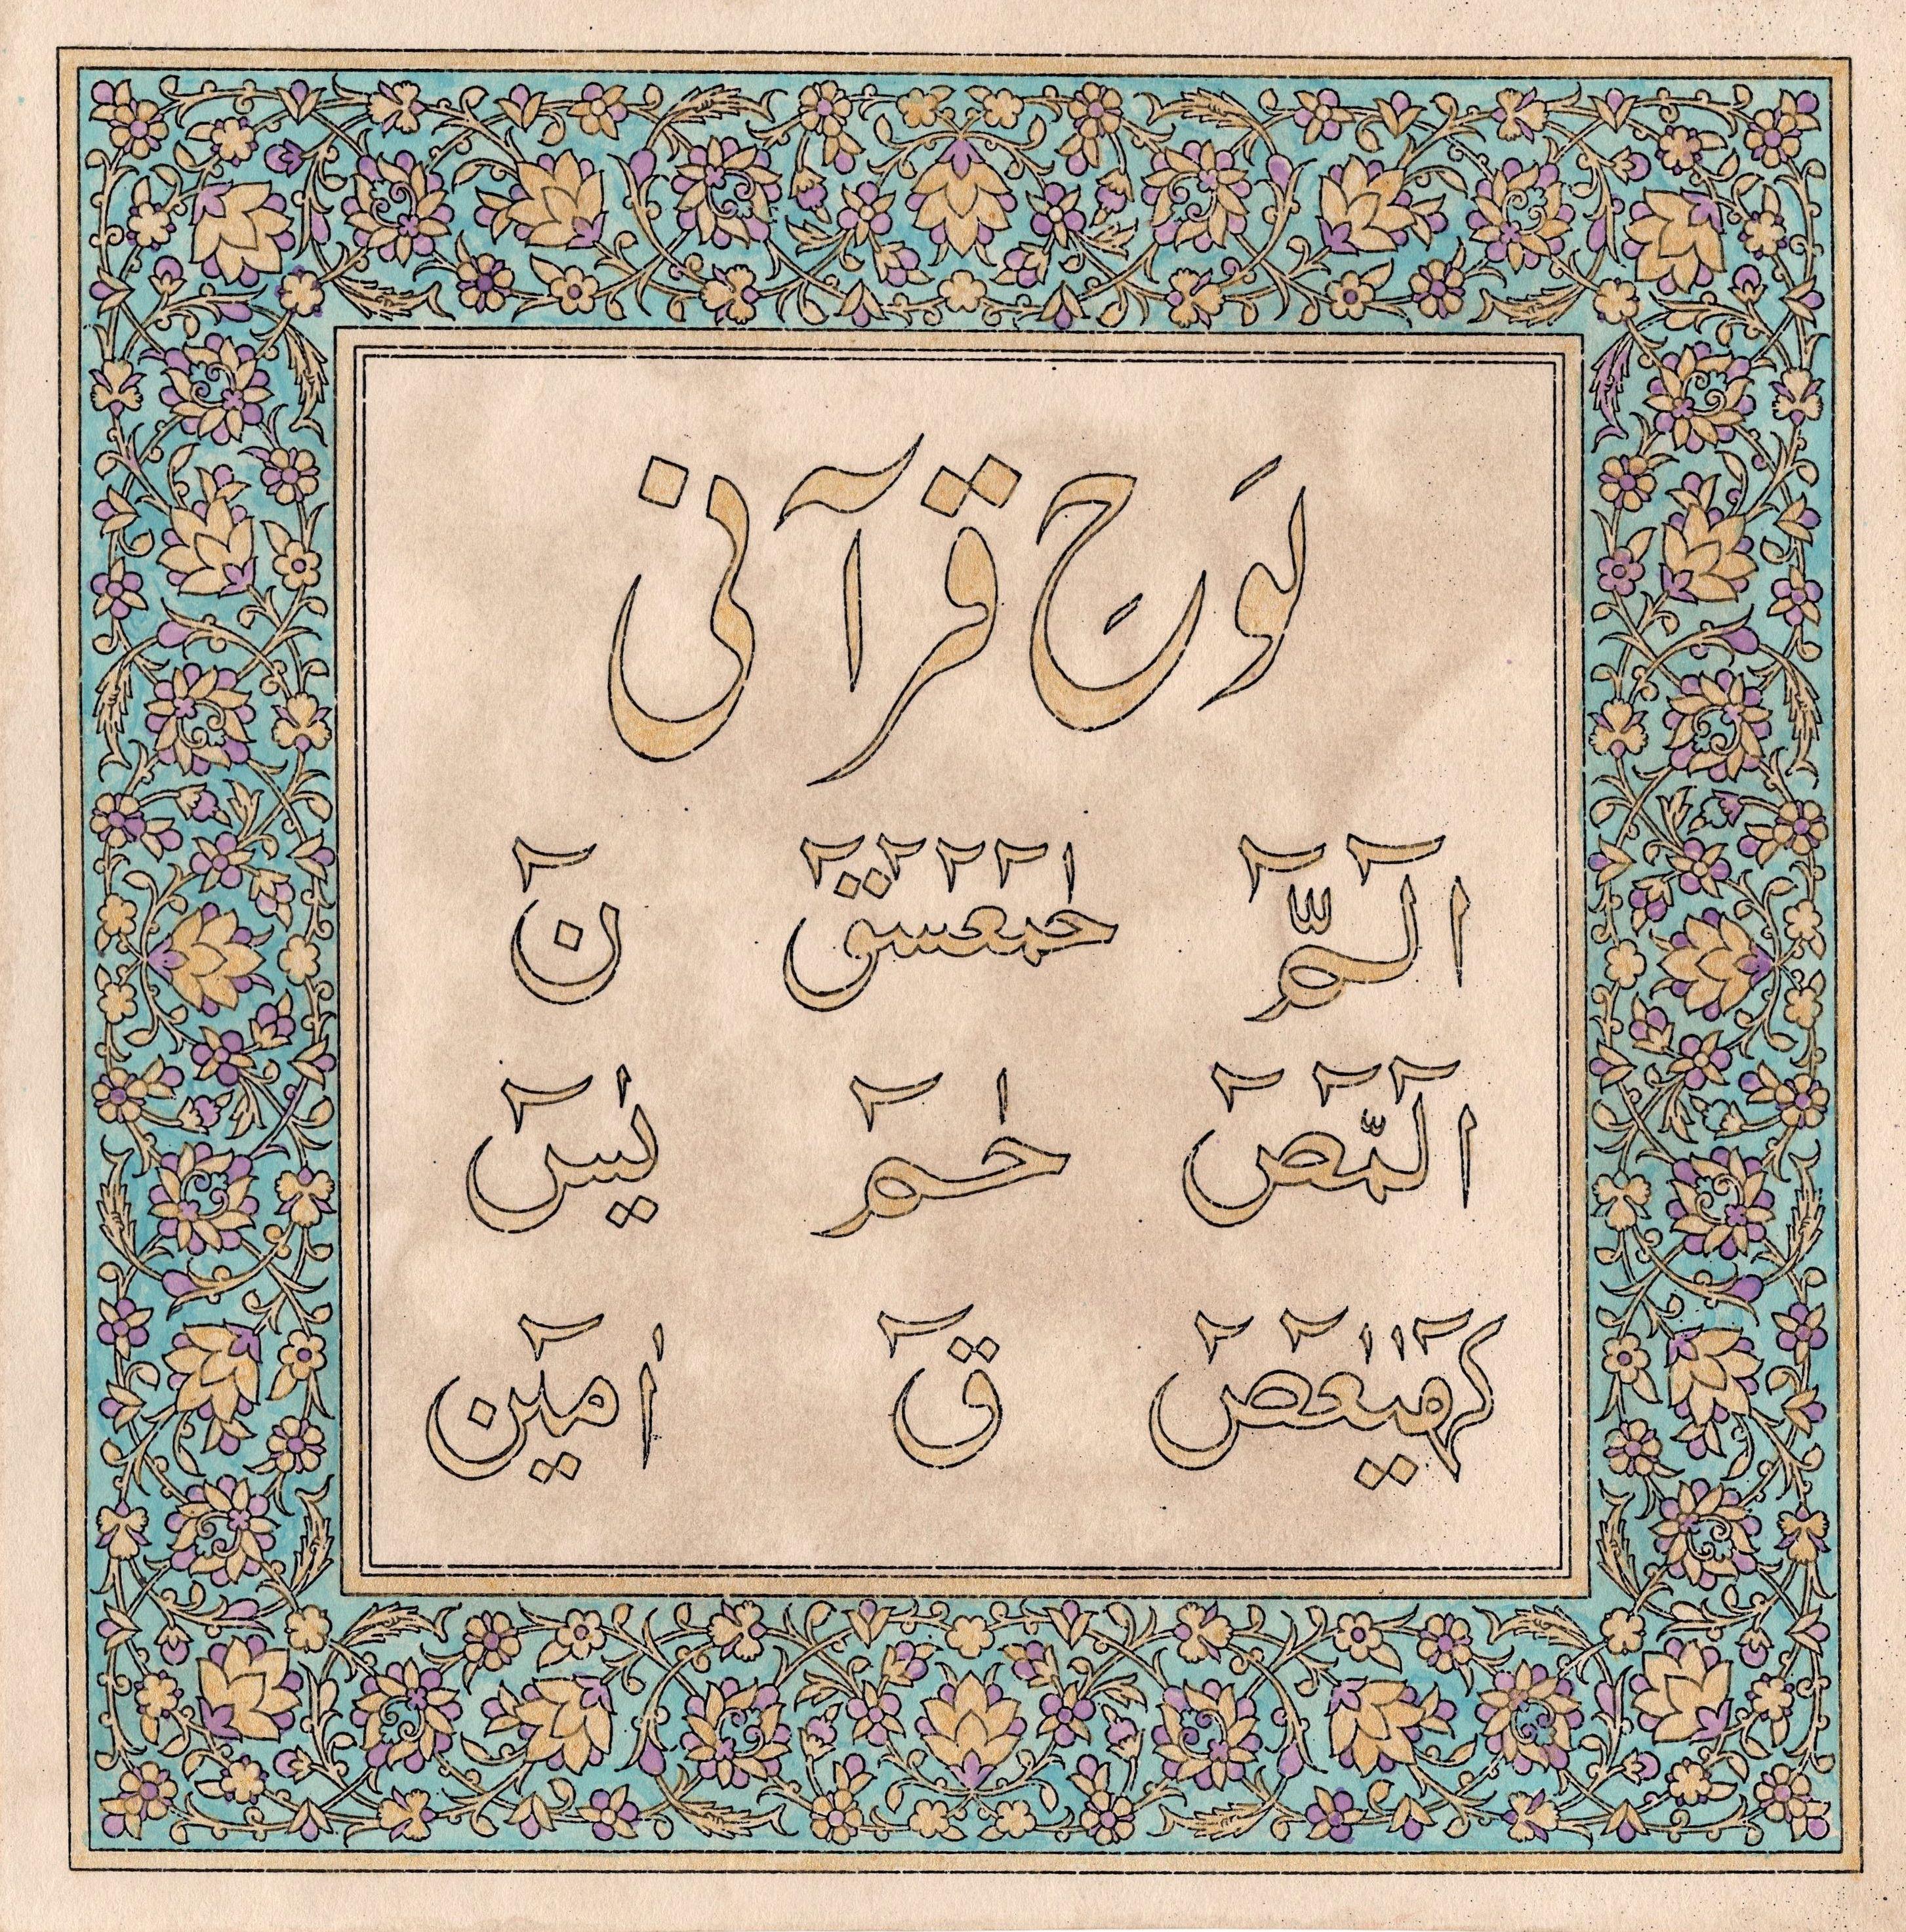 Islamic Tazhib Calligraphy Quran Art Handmade Koran Arabic